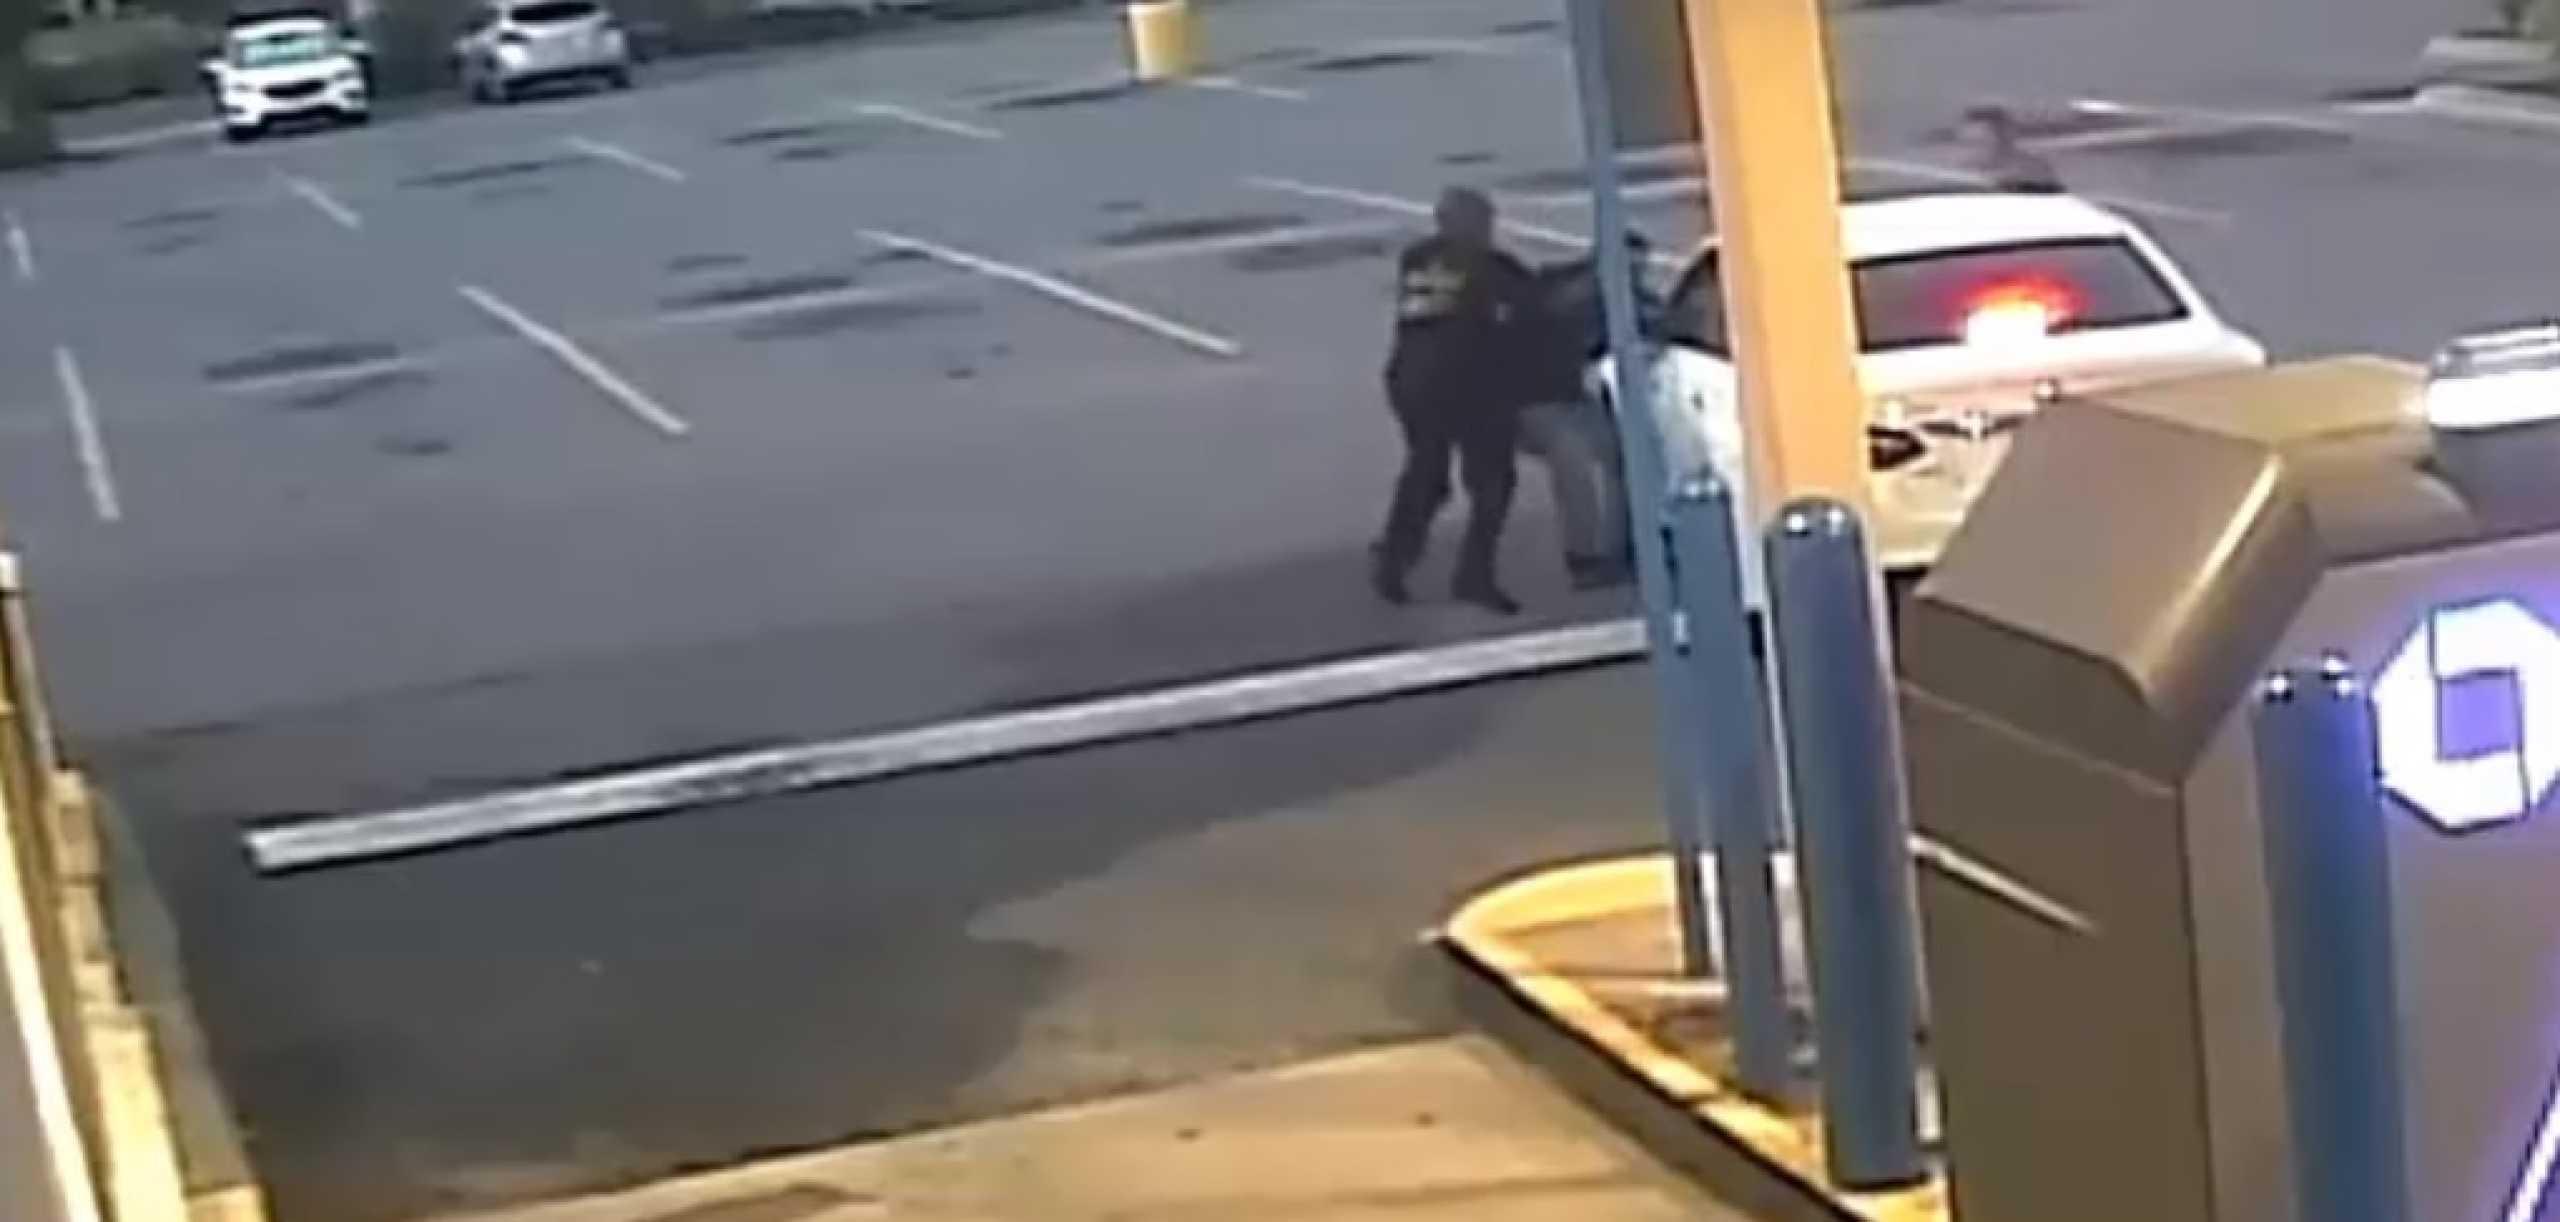 'Heróis' impedem roubo junto a caixa multibanco